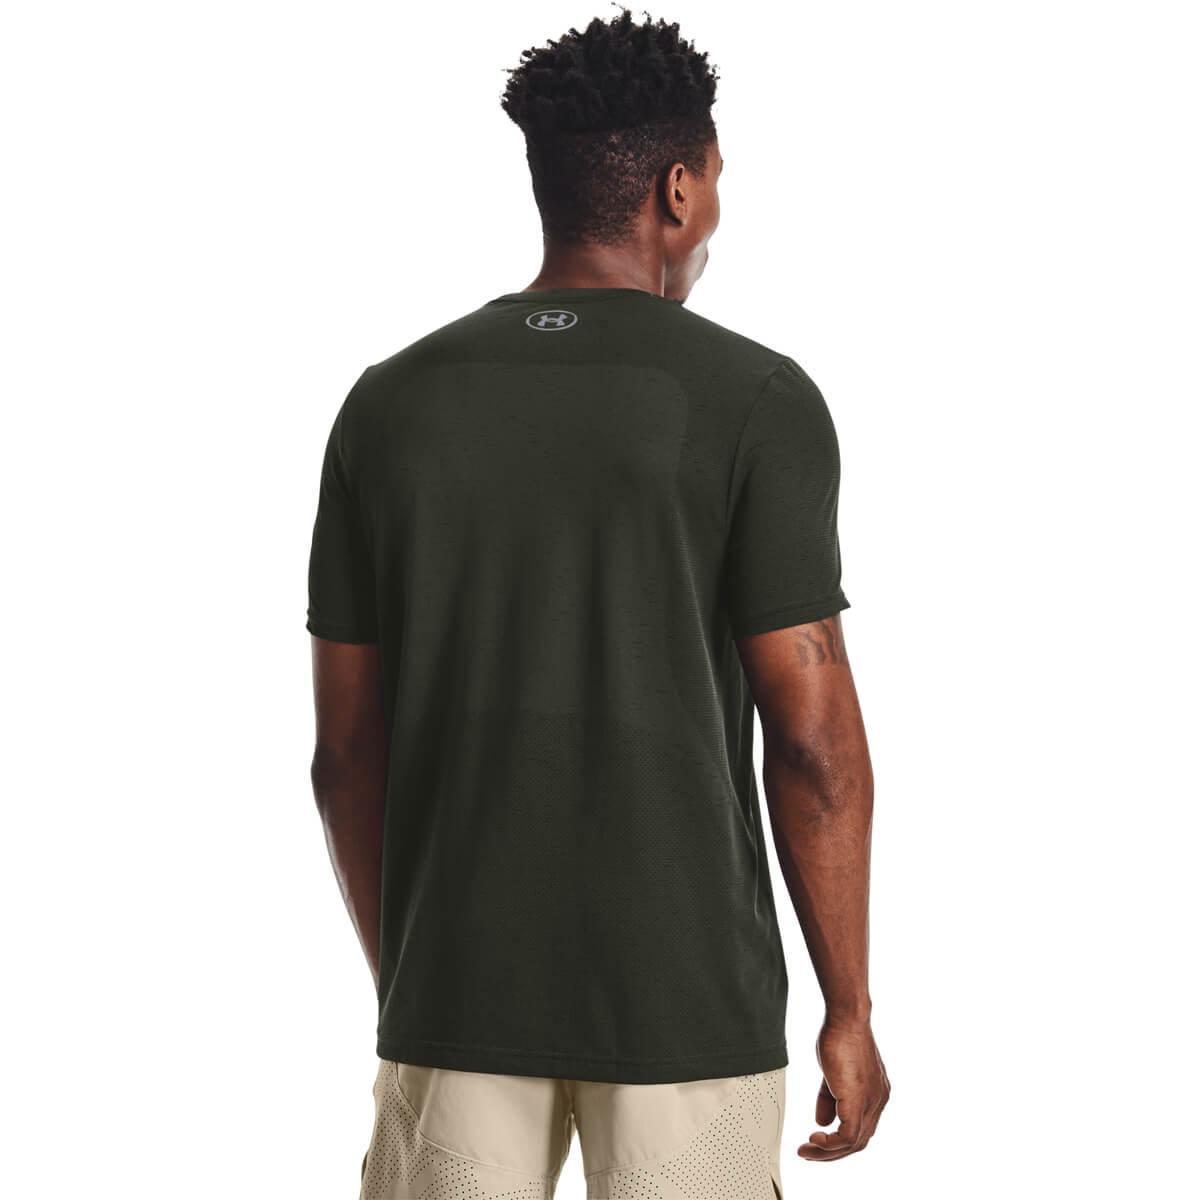 Under Armour Seamless Trænings T-shirt Herre